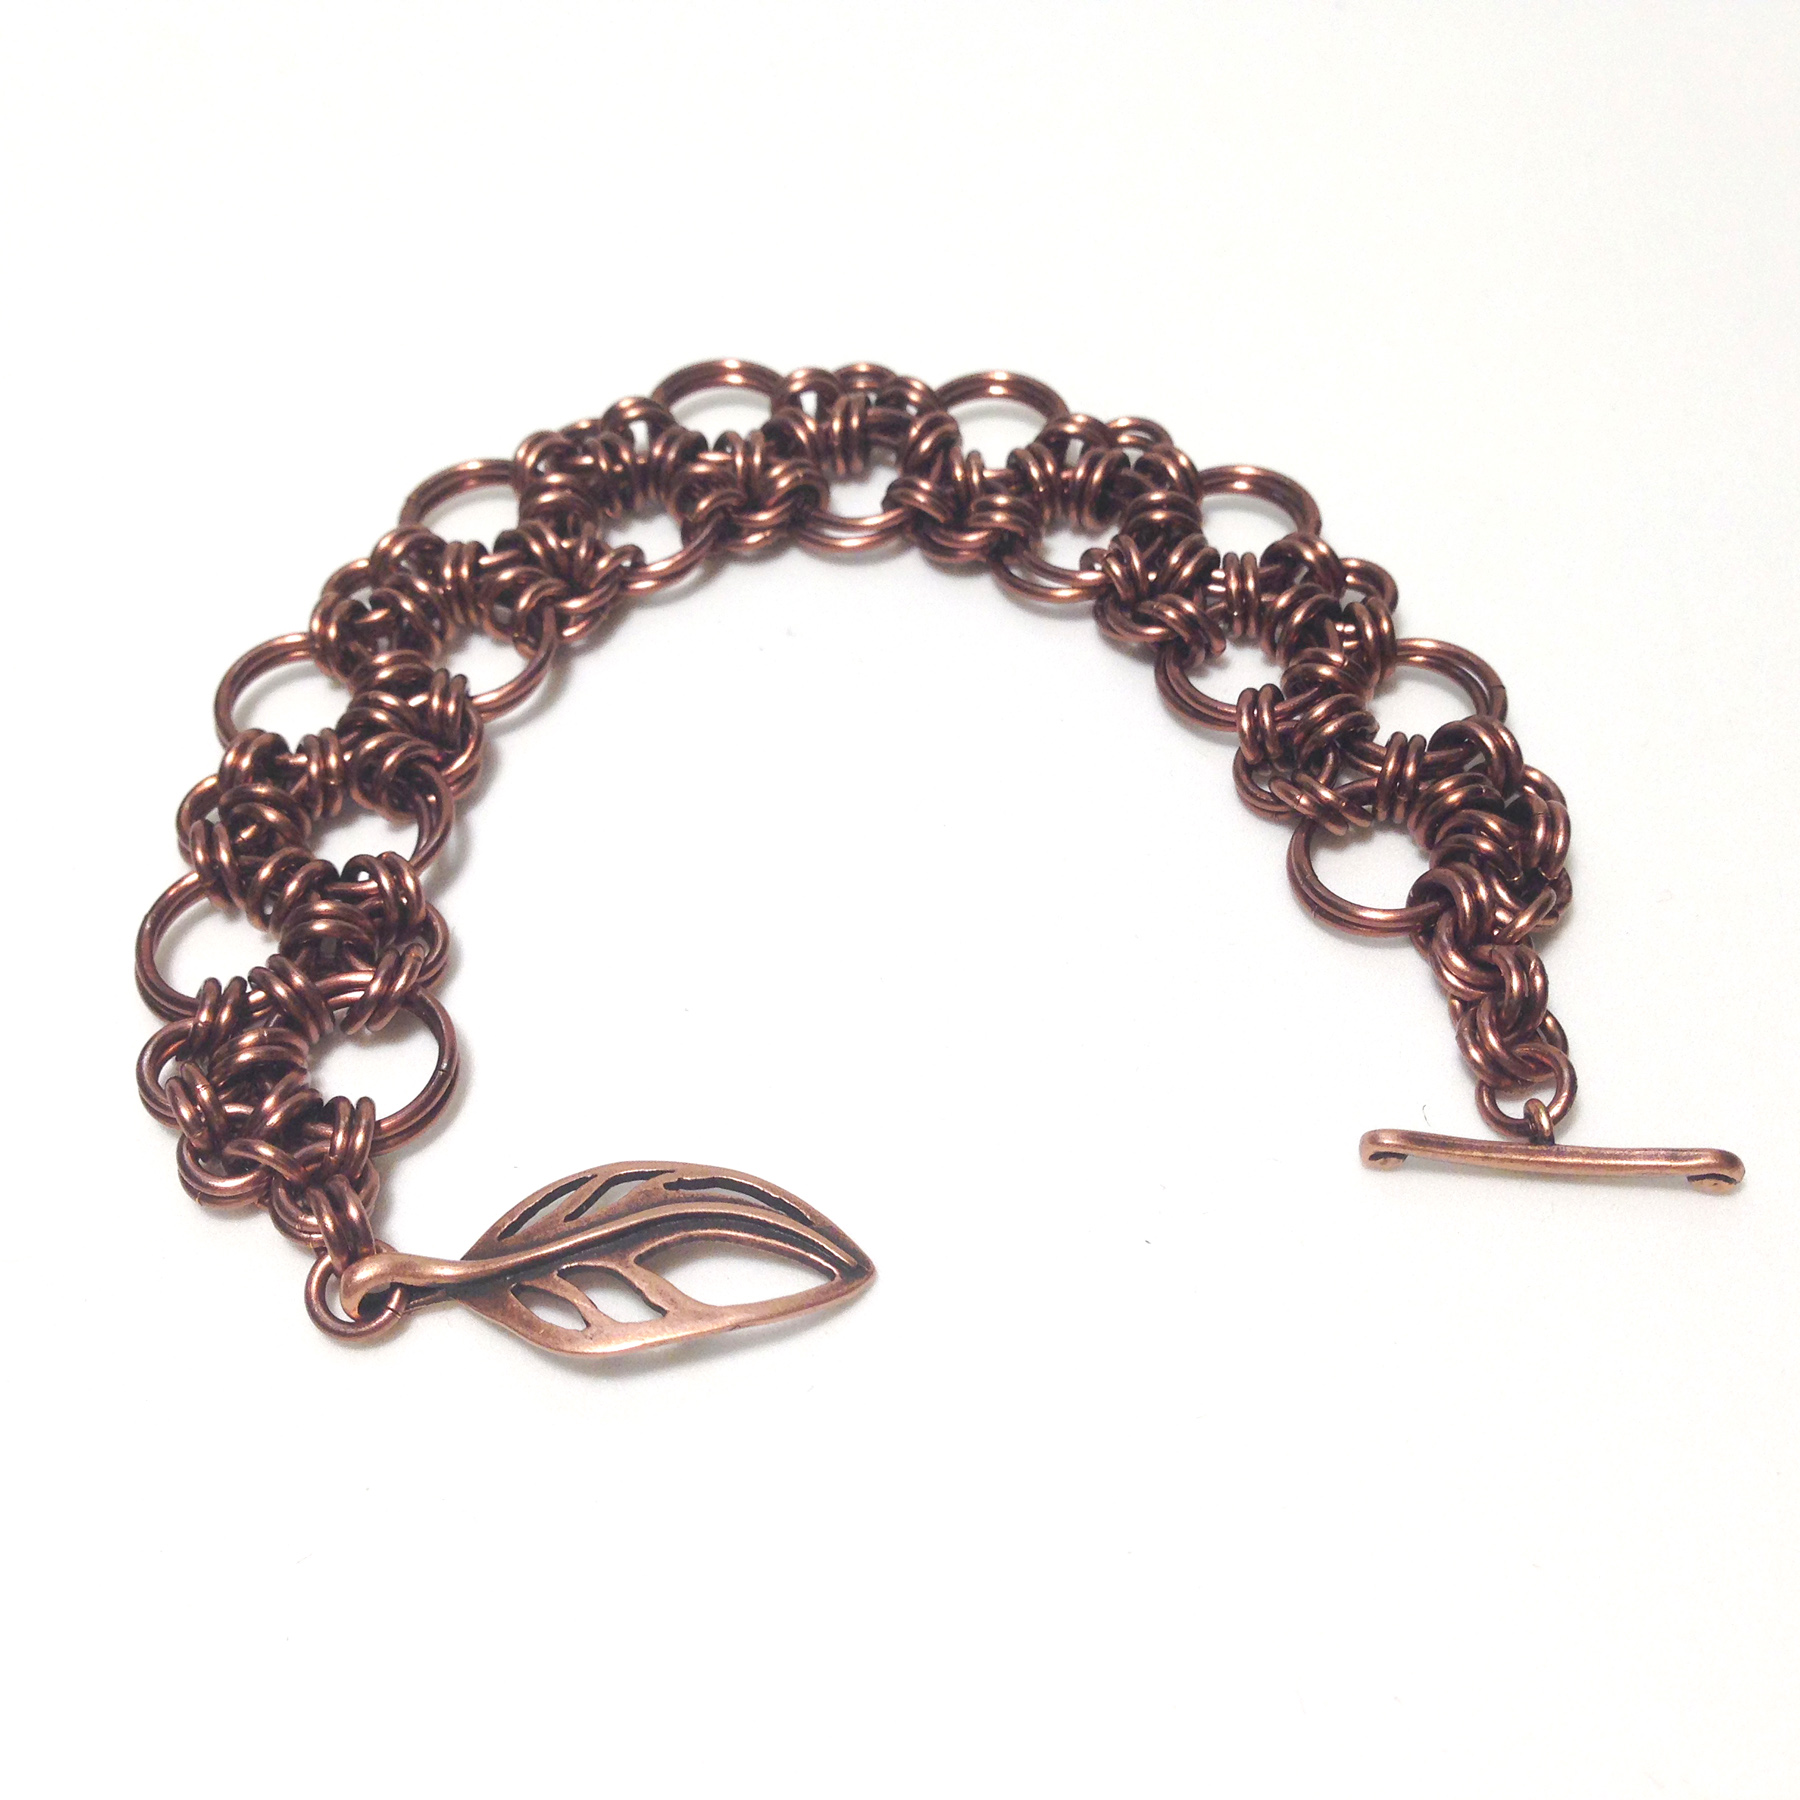 Bracelet_W224.jpeg